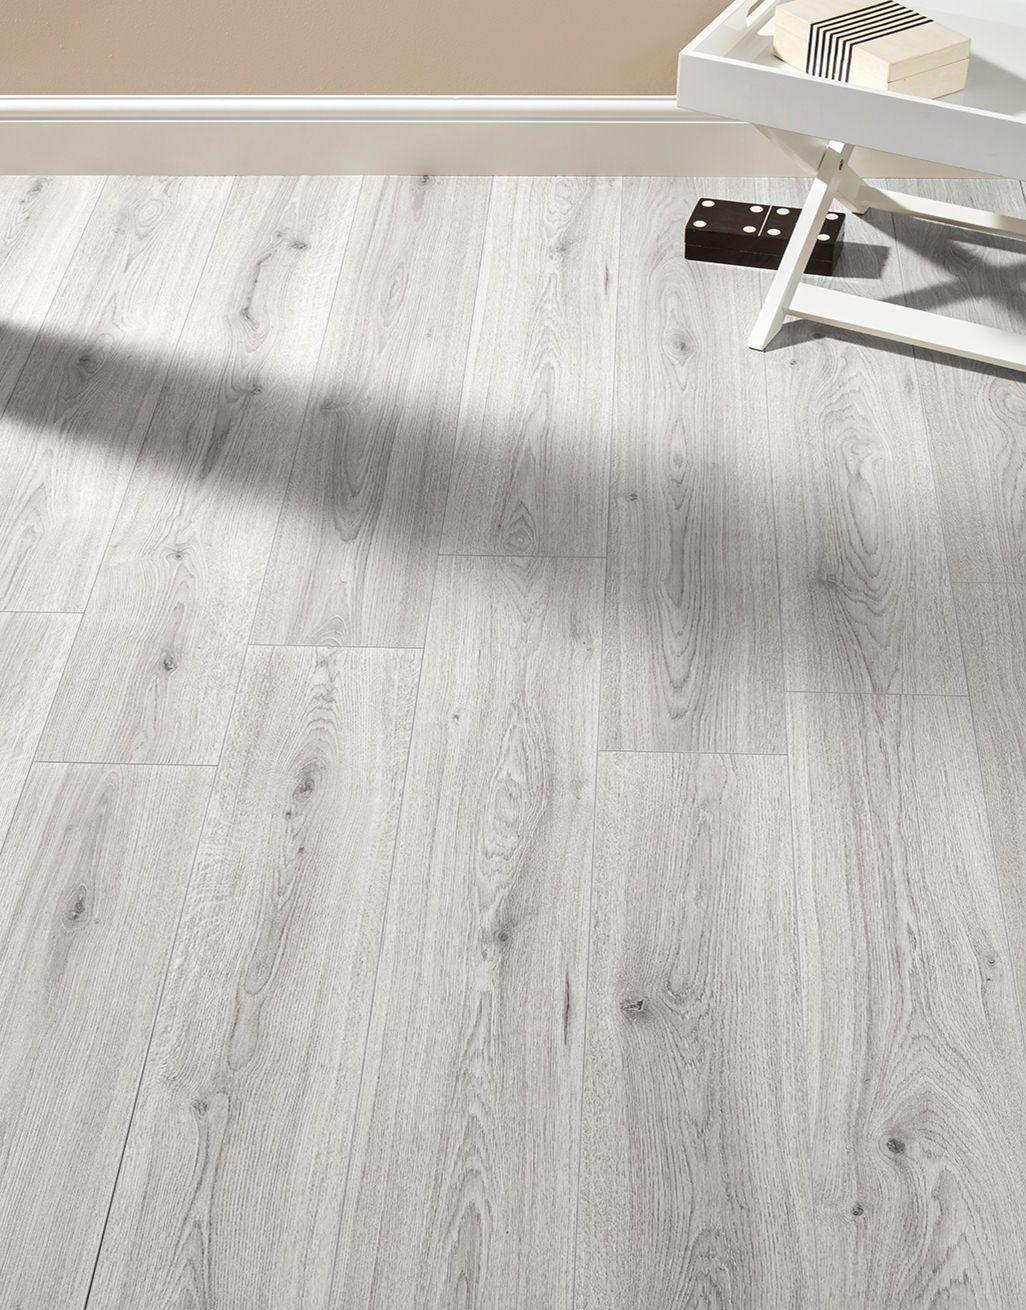 Farmhouse Light Grey Oak Laminate Flooring Direct Wood Flooring